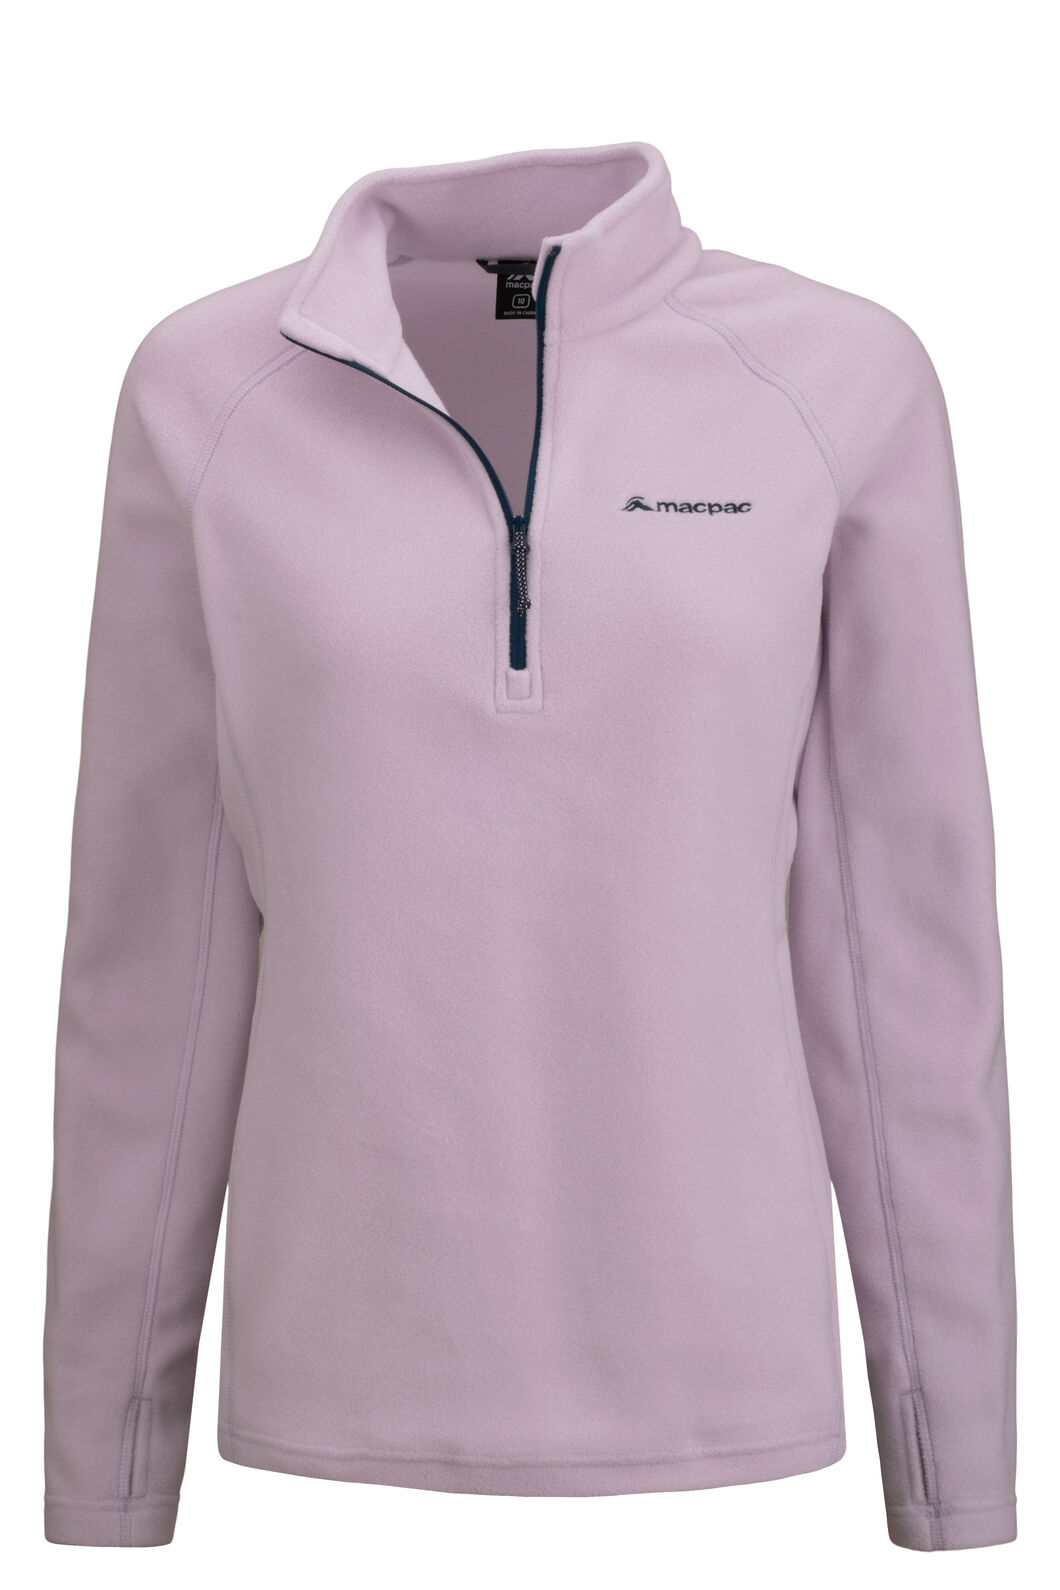 Macpac Women's Tui Polartec® Micro Fleece® Pullover, Orchid Hush, hi-res